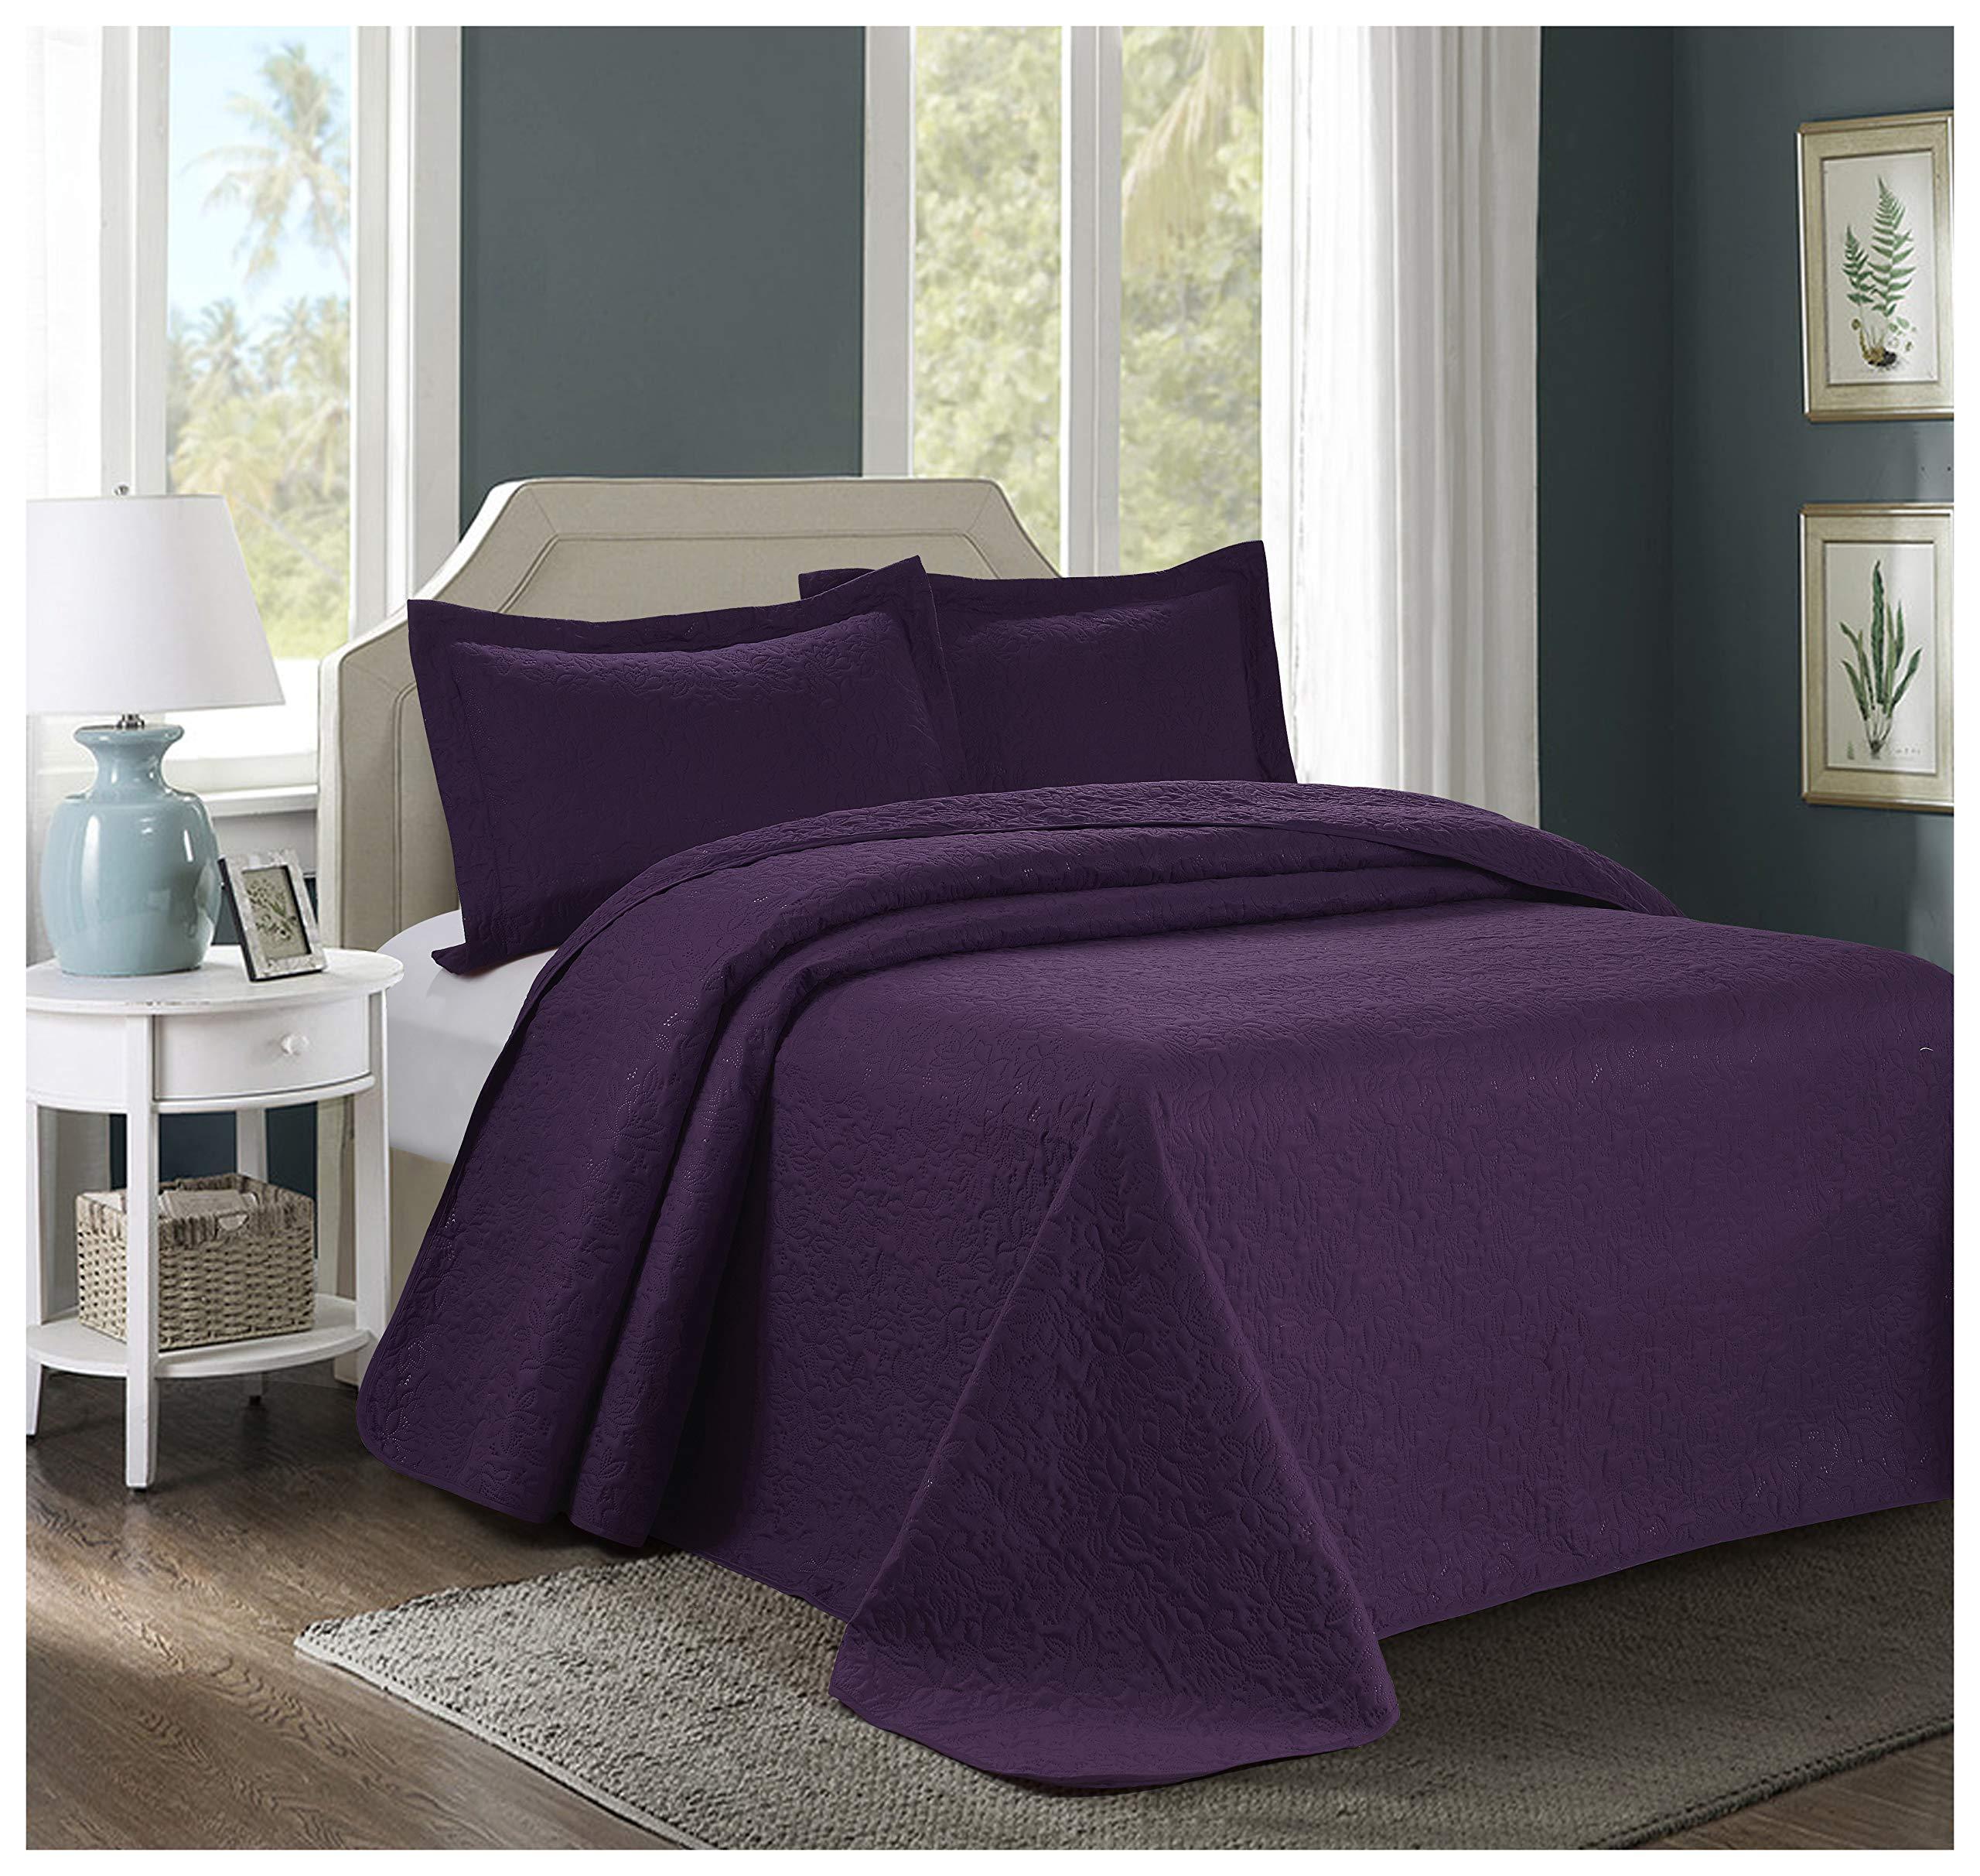 3 Piece JULES Ultrasonic Embossed Bedspread Set-Oversized Coverlet 100x106in, 118x106in (Queen, Purple)